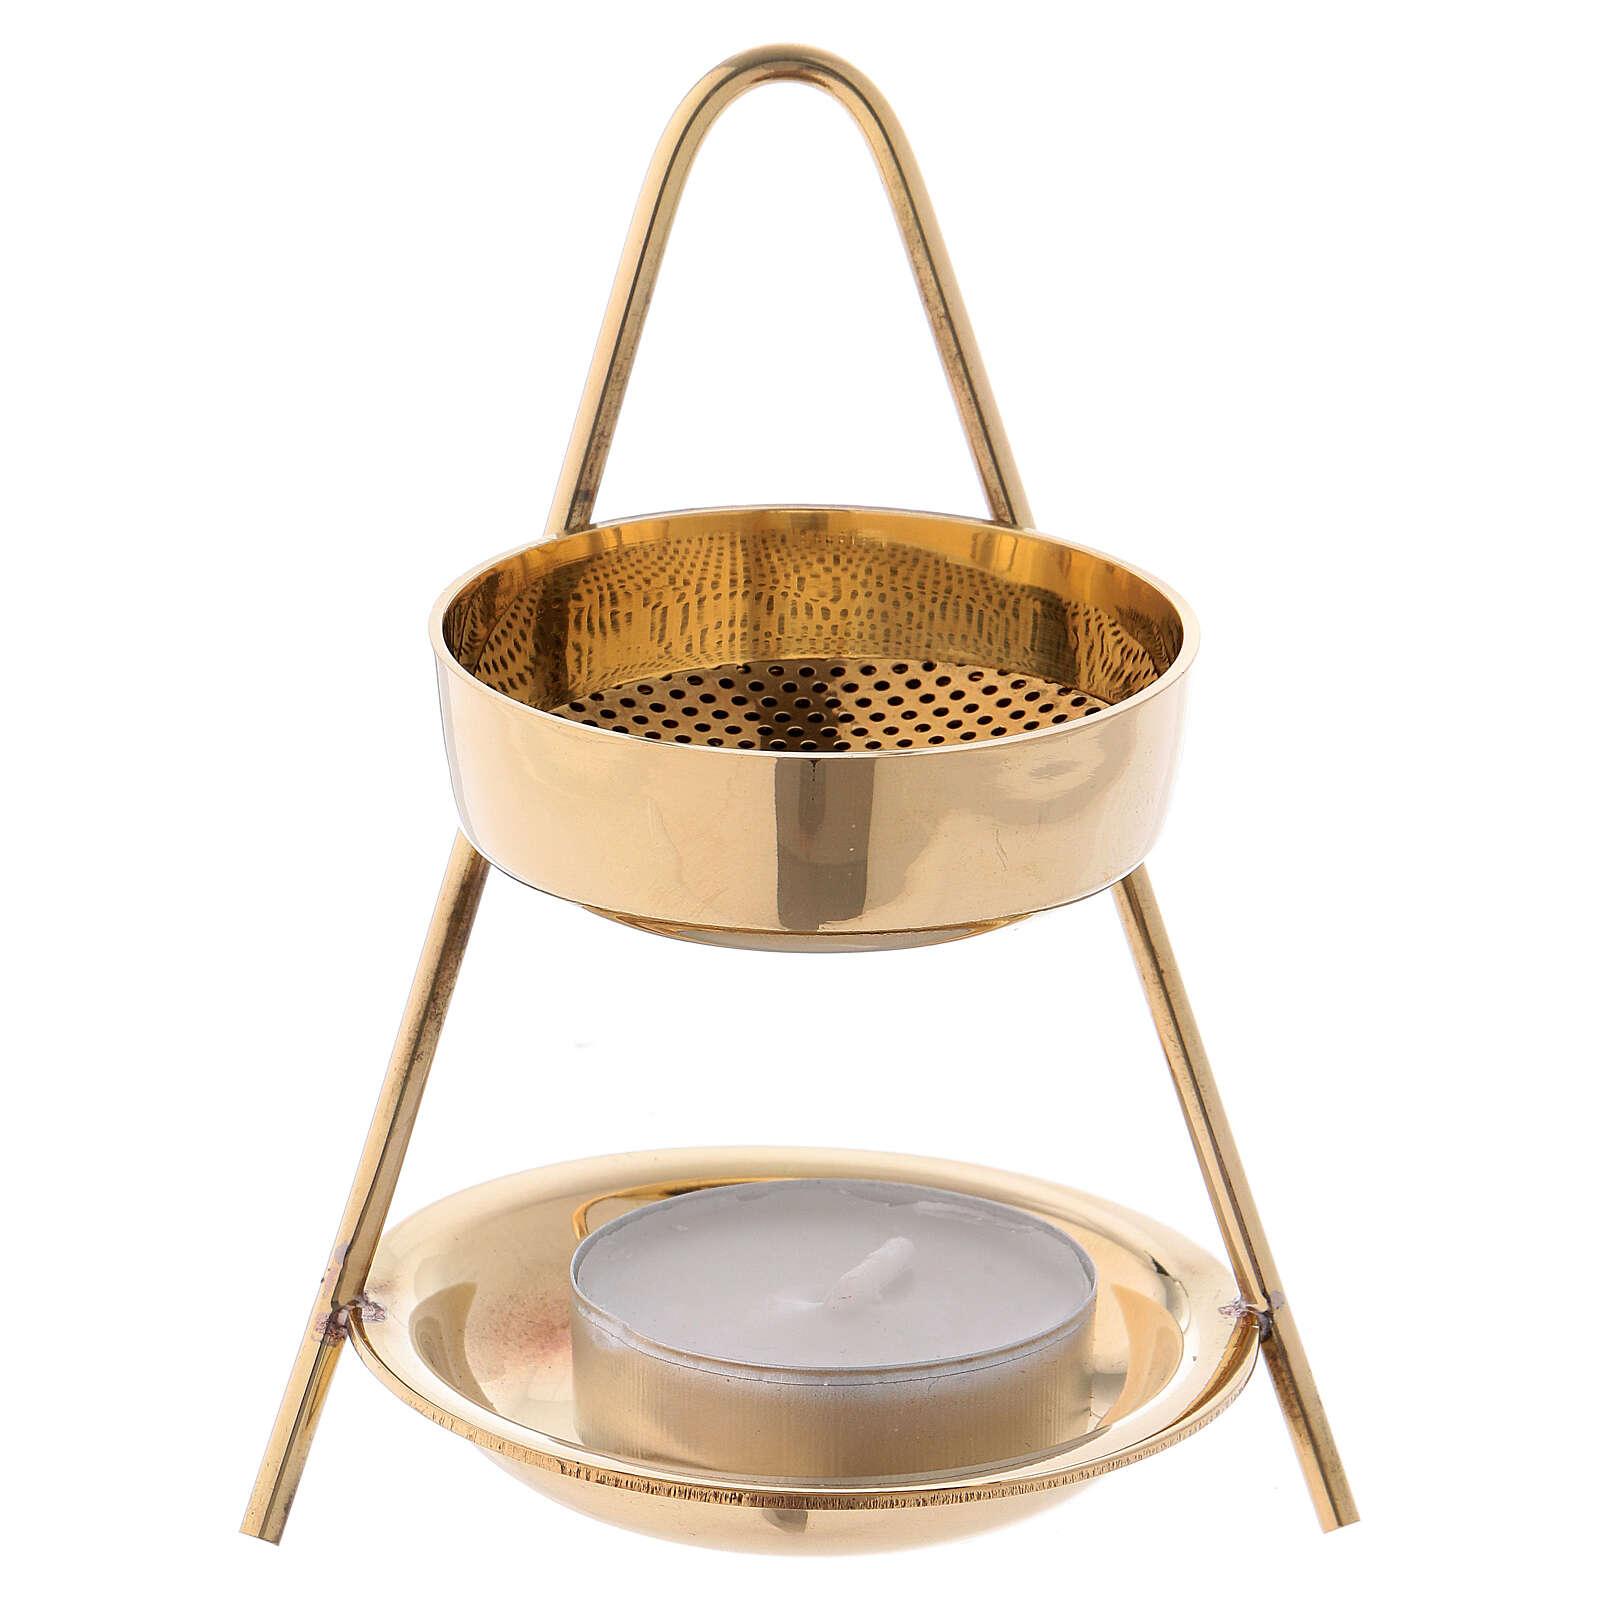 Gold plated polish brass incense burner 4 in 3